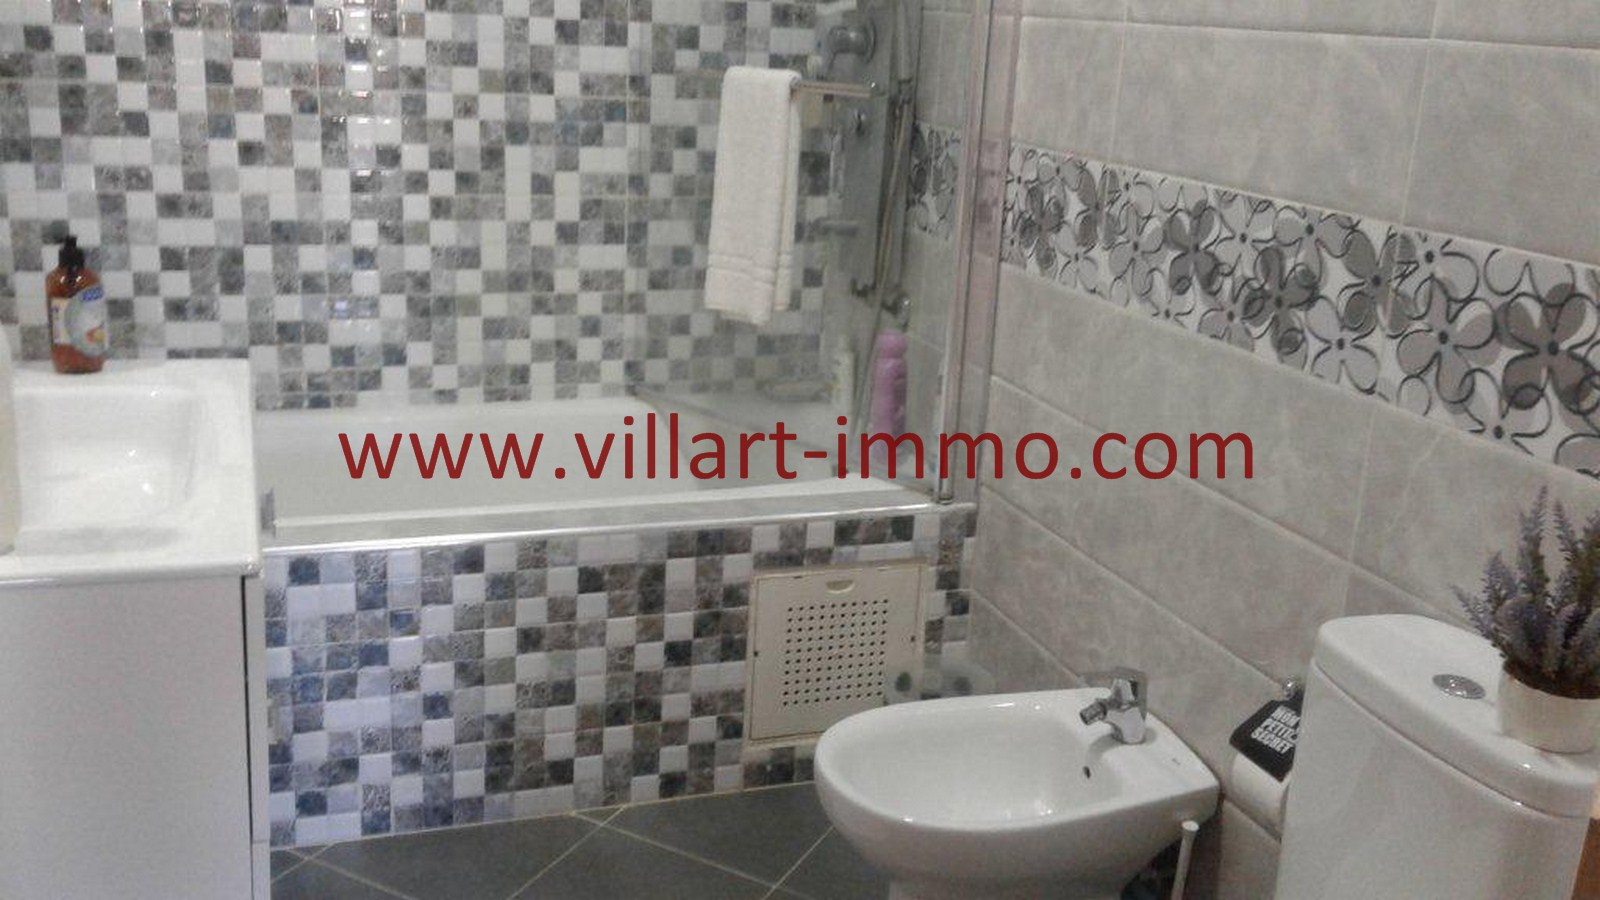 5-A vendre-Appartement-Tanger-Castilla-Salle-De-Bain-VA473-Villart immo-Agence Immobilière